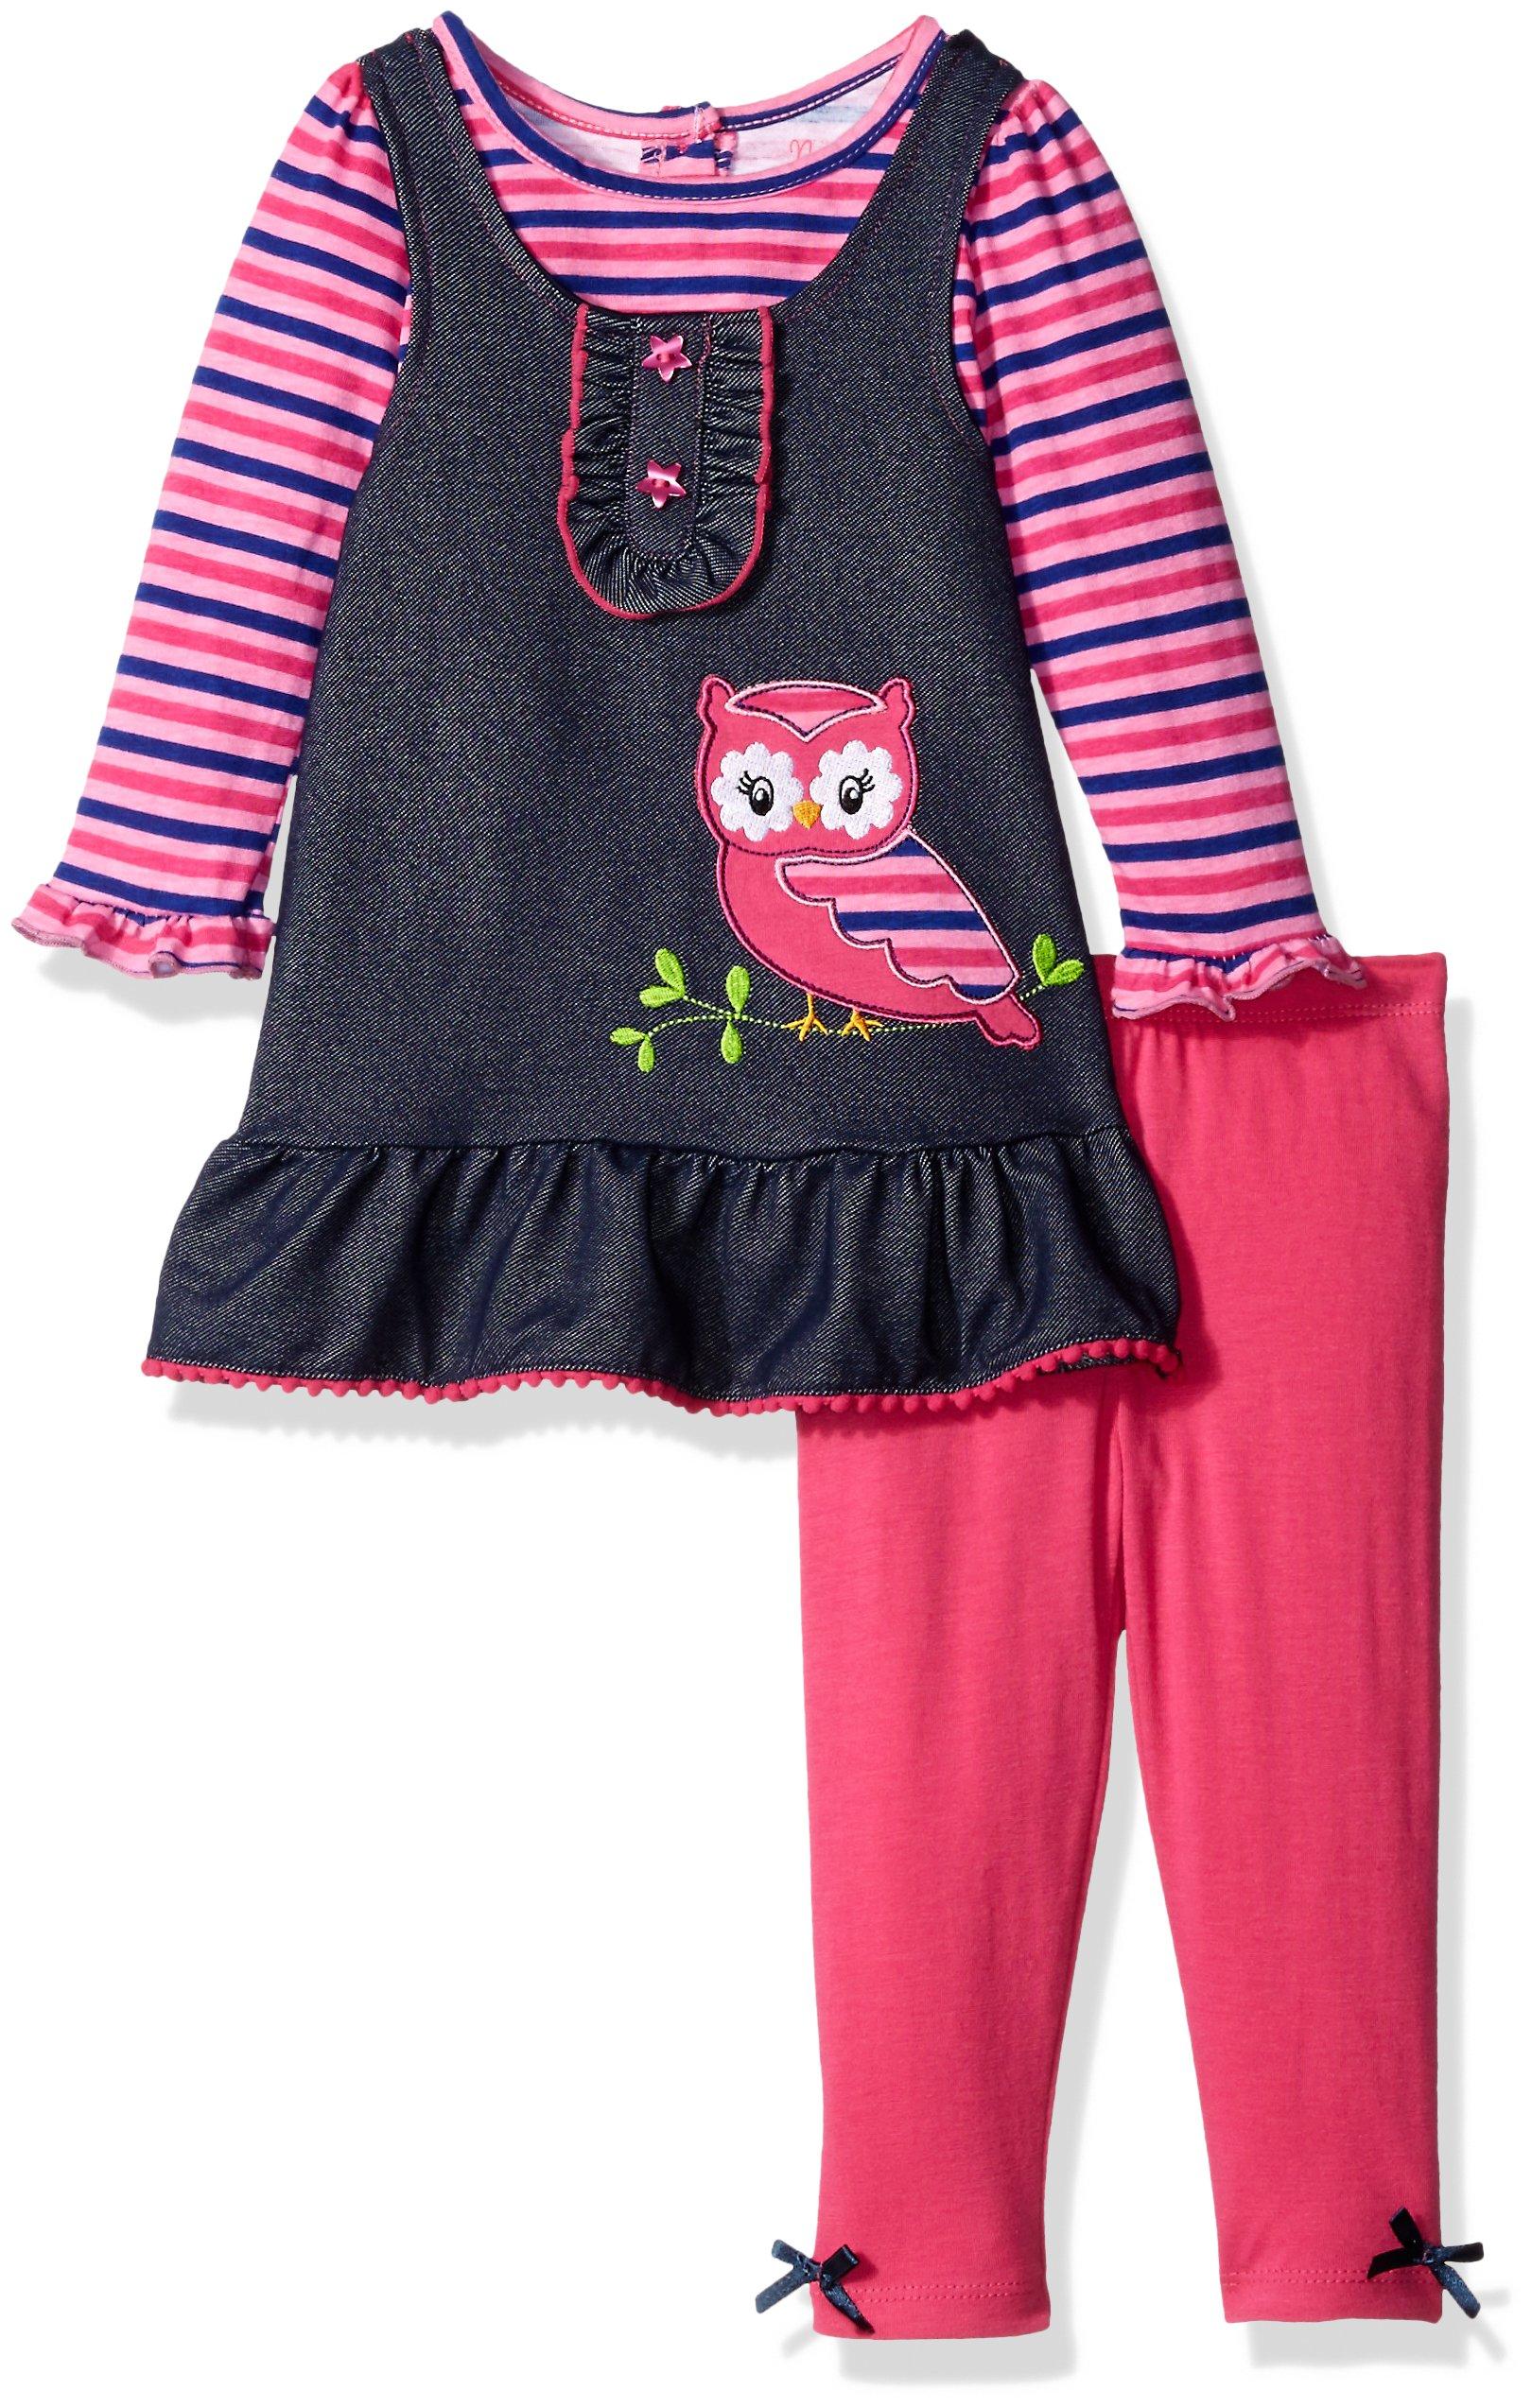 Nannette Baby Girls' 2 Piece Mock 2fer Top Playwear Set, Pink, 24 Months